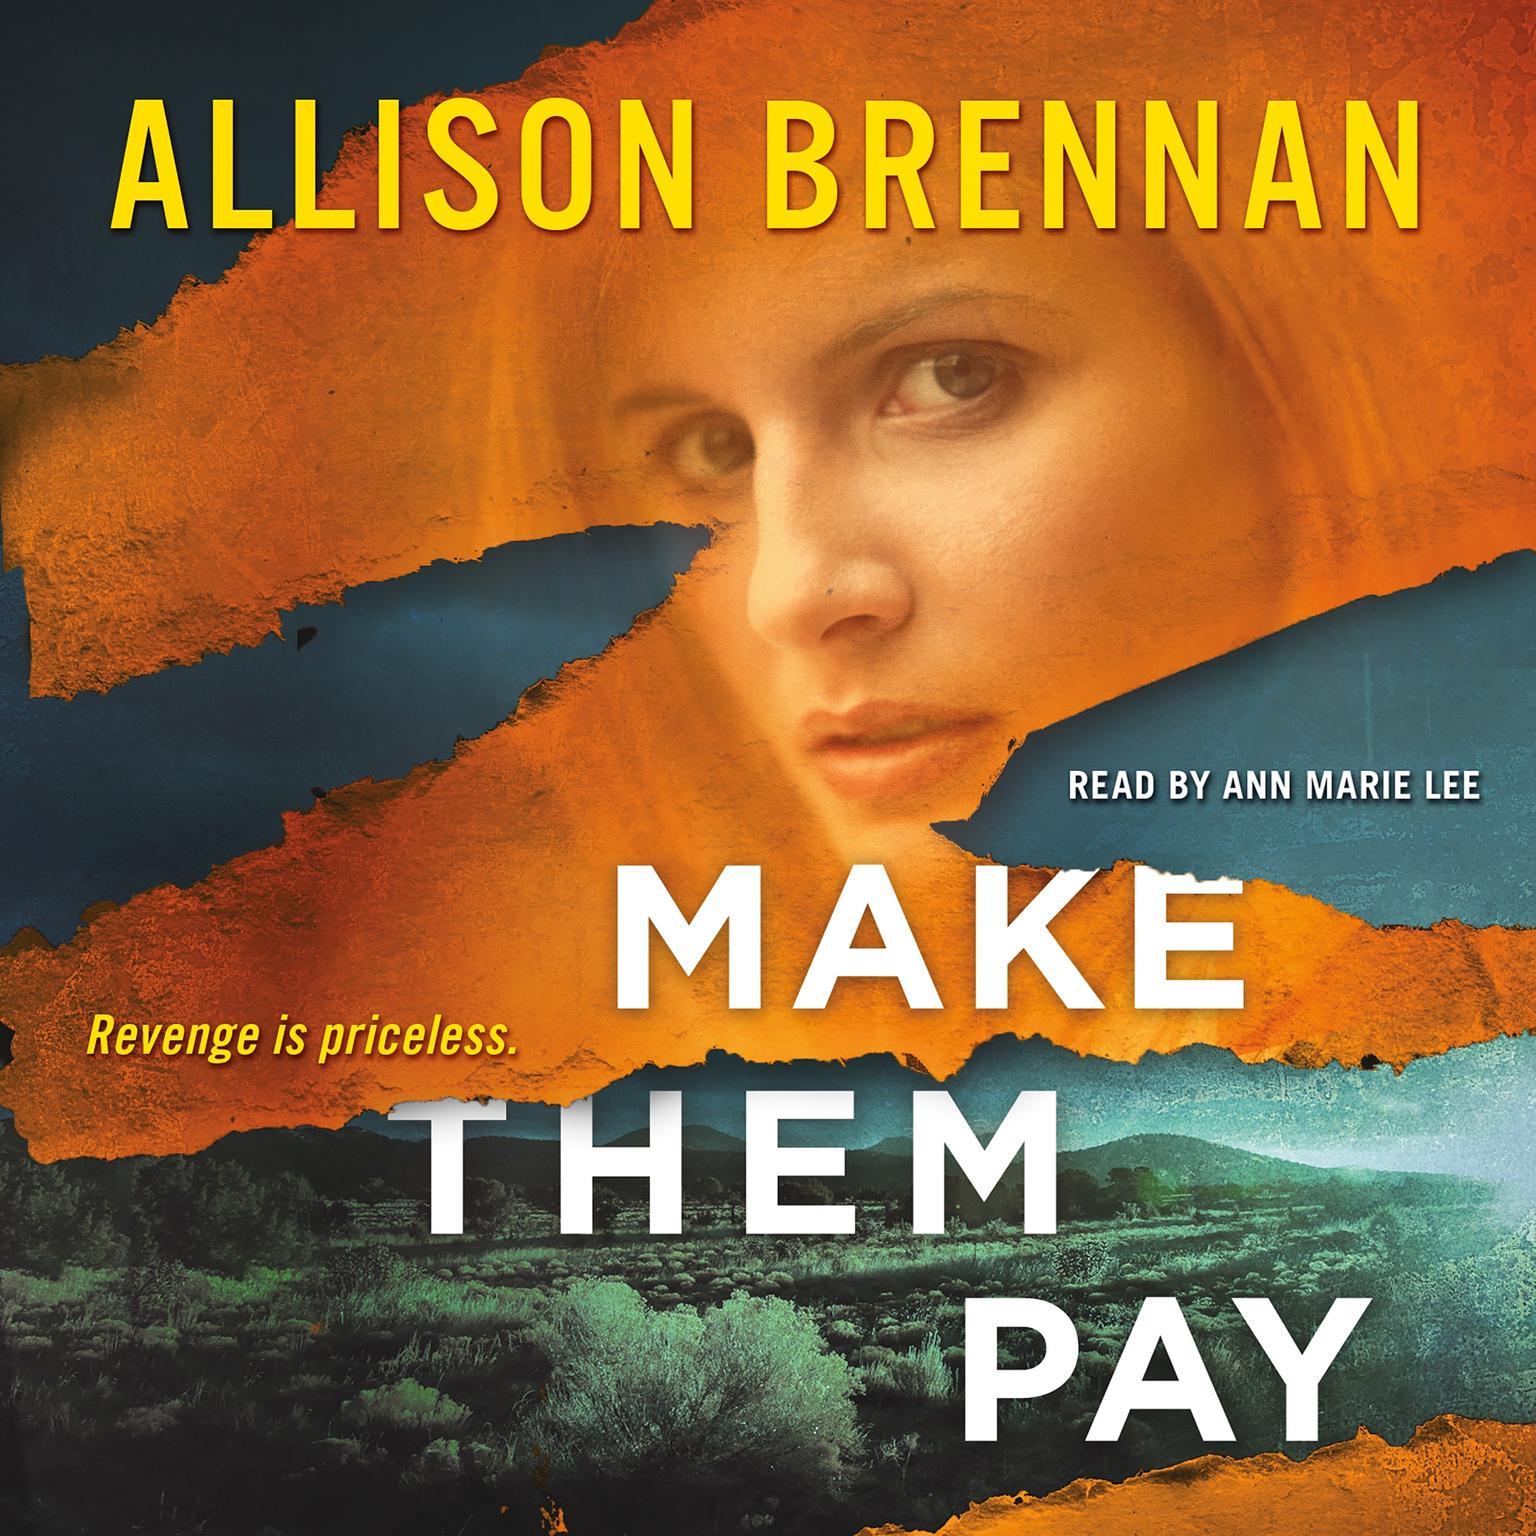 Make Them Pay Audiobook, by Allison Brennan